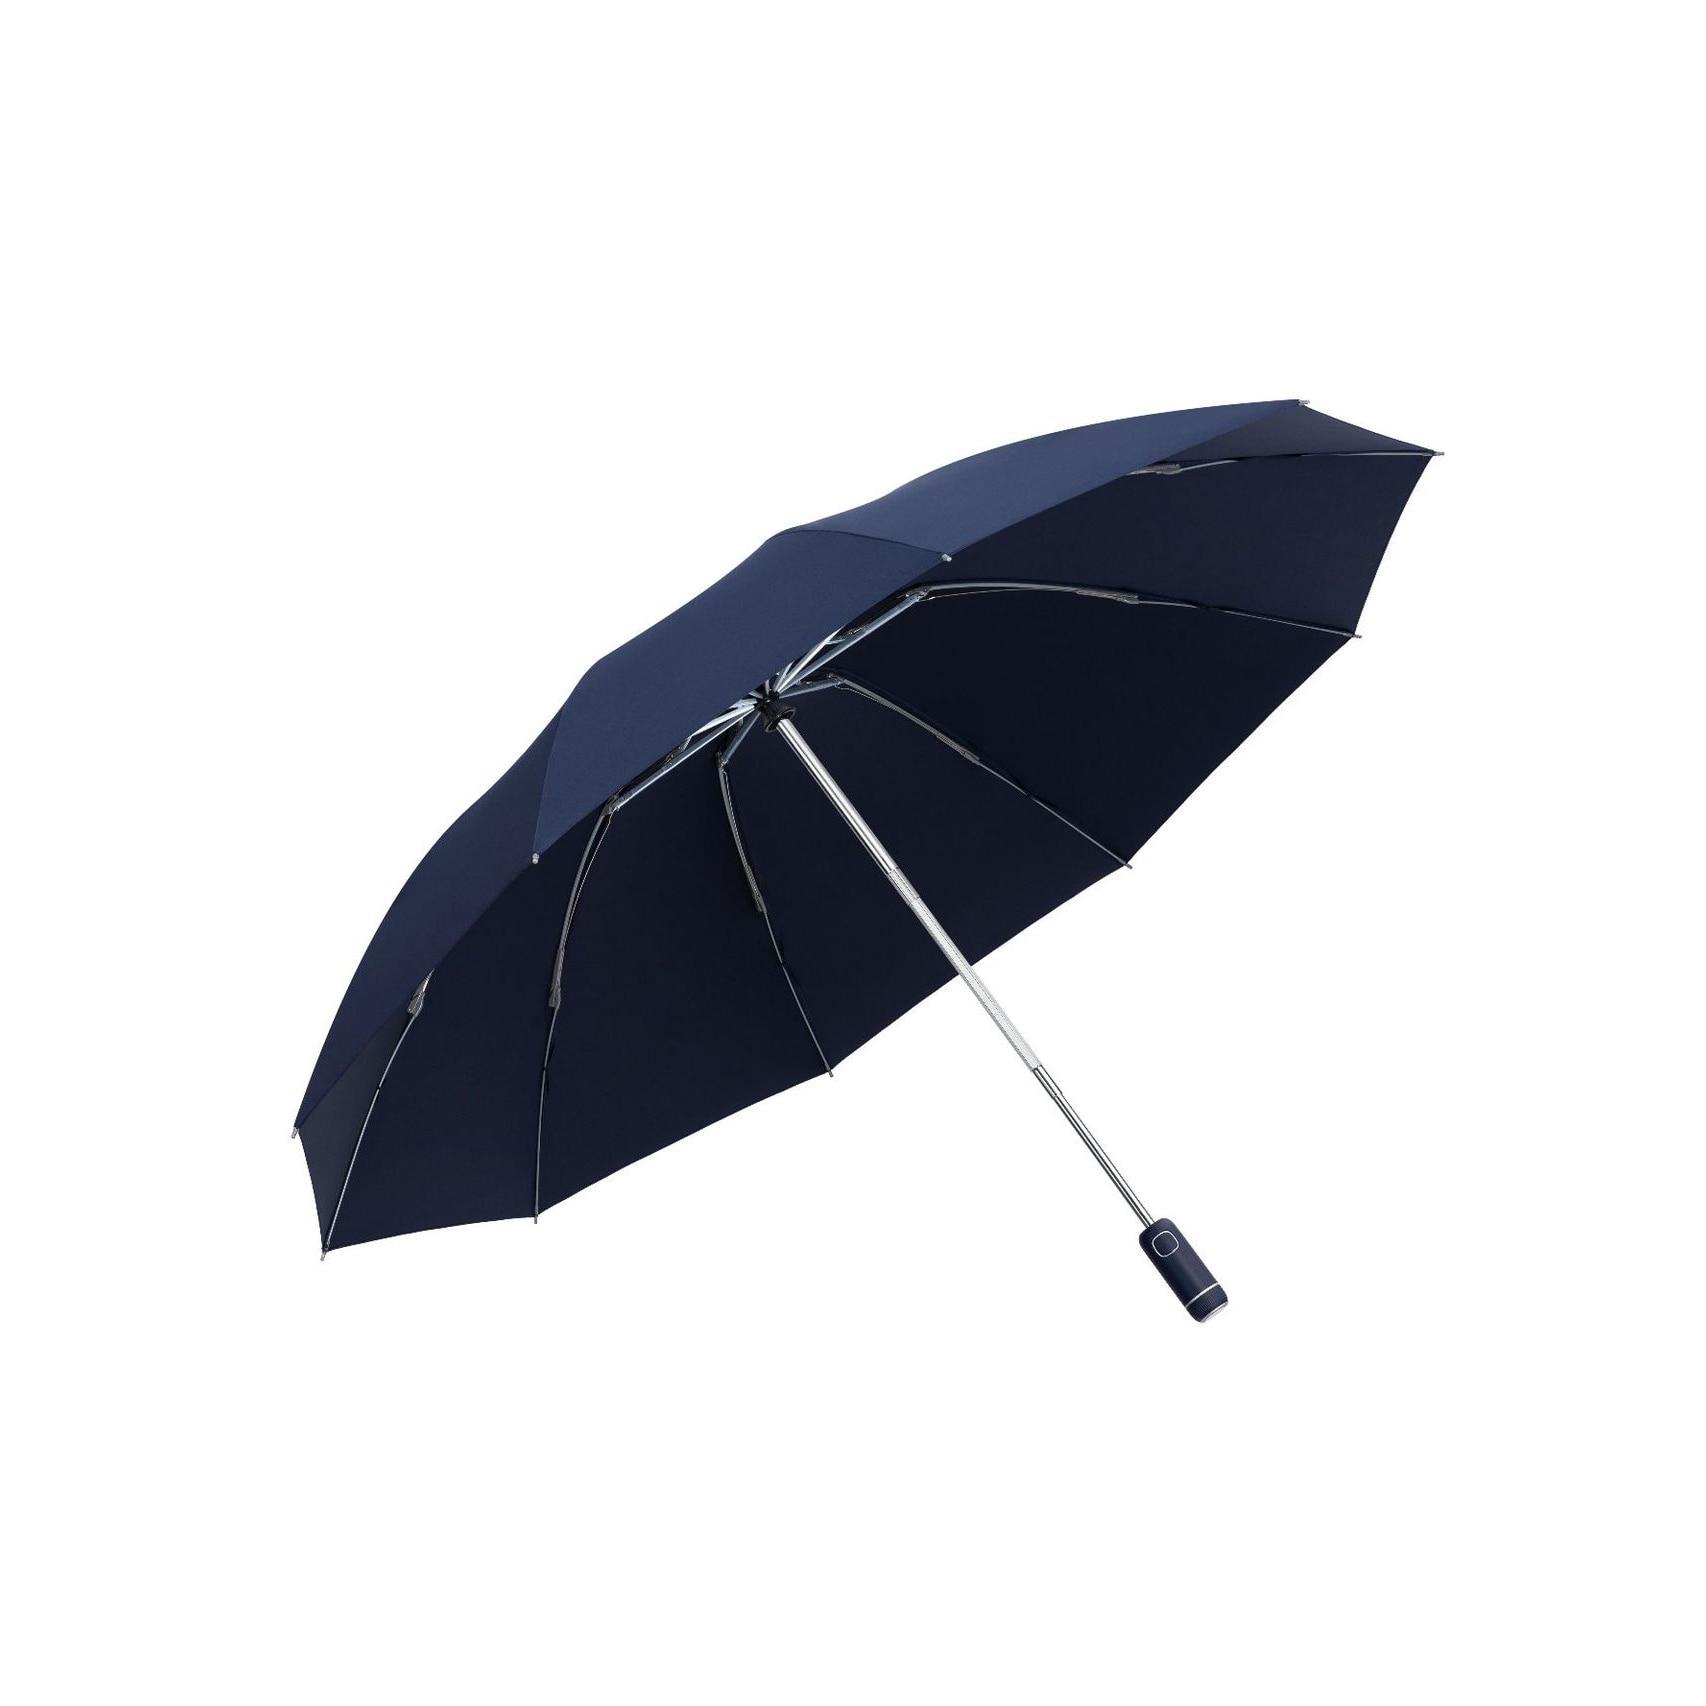 Windproof Women's Umbrella Male Man Automatic Folding Inverted Umbrella With LED Flashlight Reflective Rain Sun Reverse Umbrella enlarge